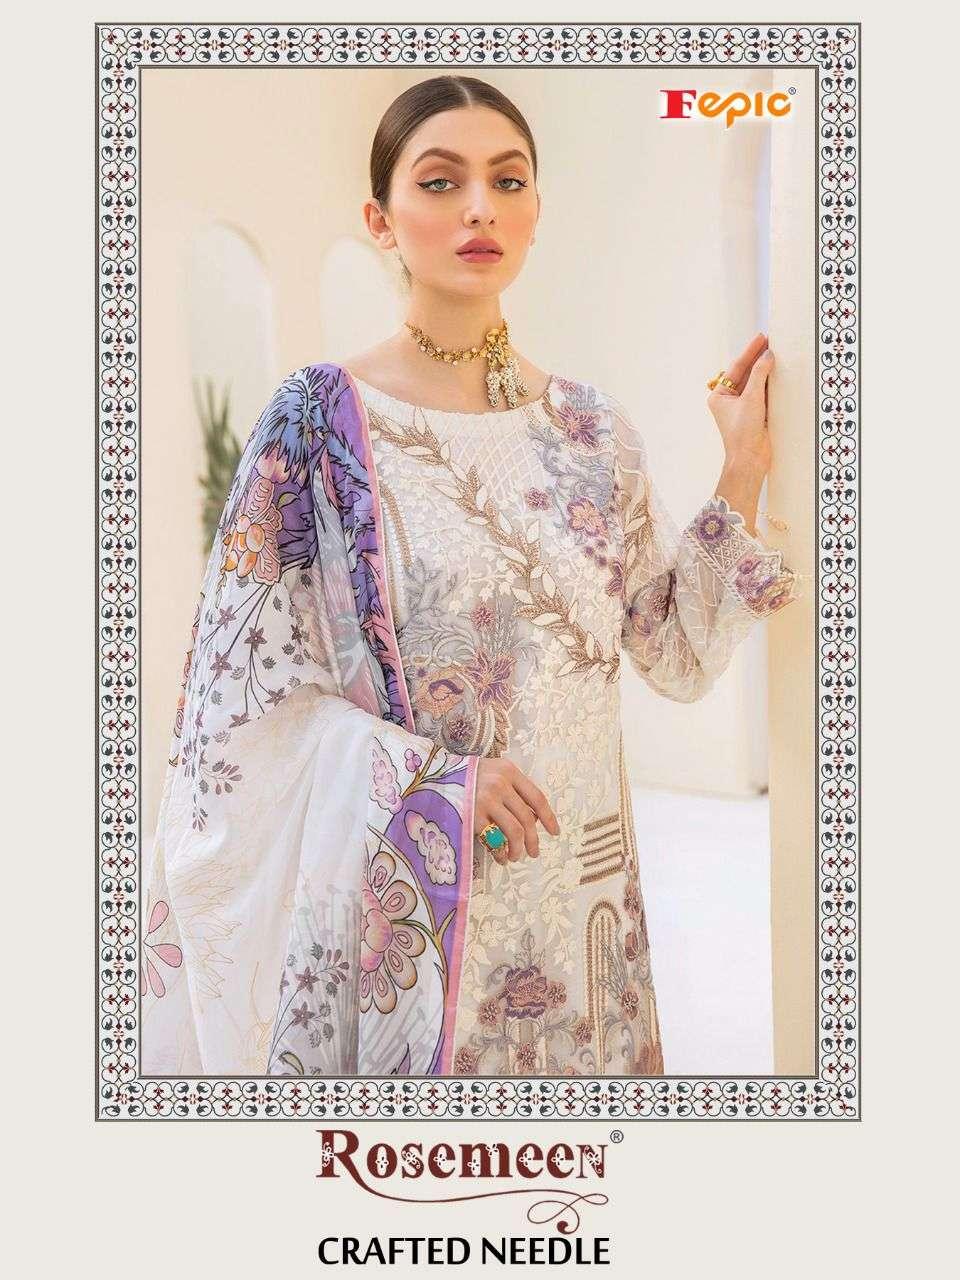 Fepic Crafted Needle Georgette Pakistani Fancy Salwar Kameez